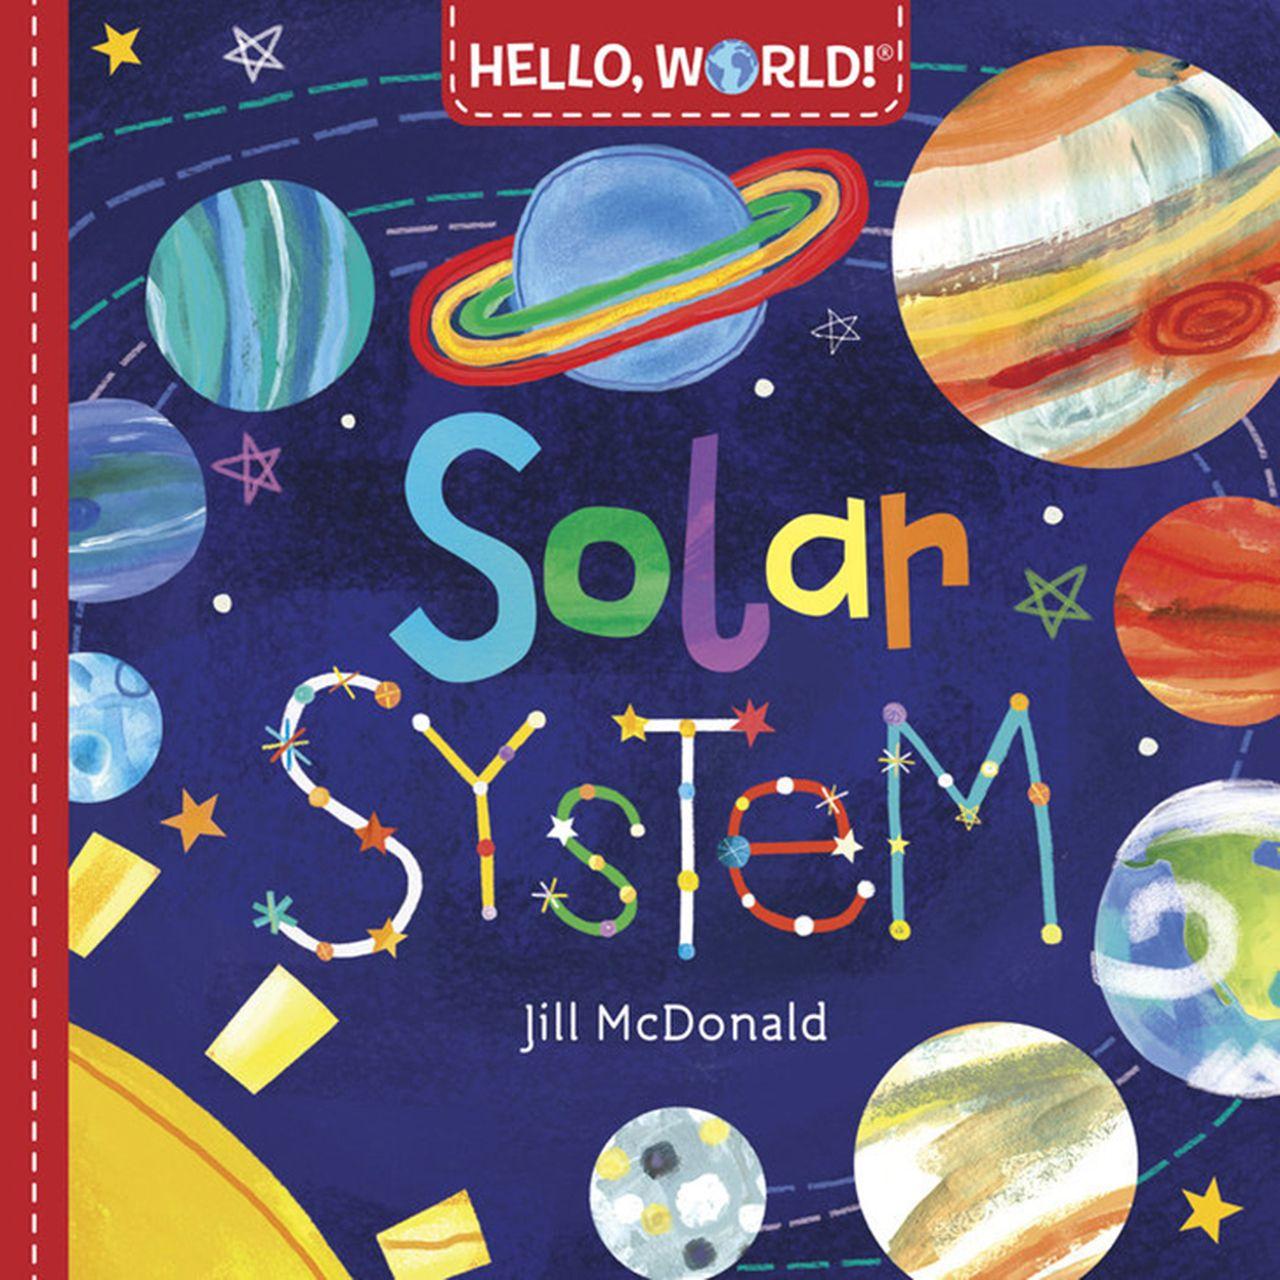 Hello World Solar System Book